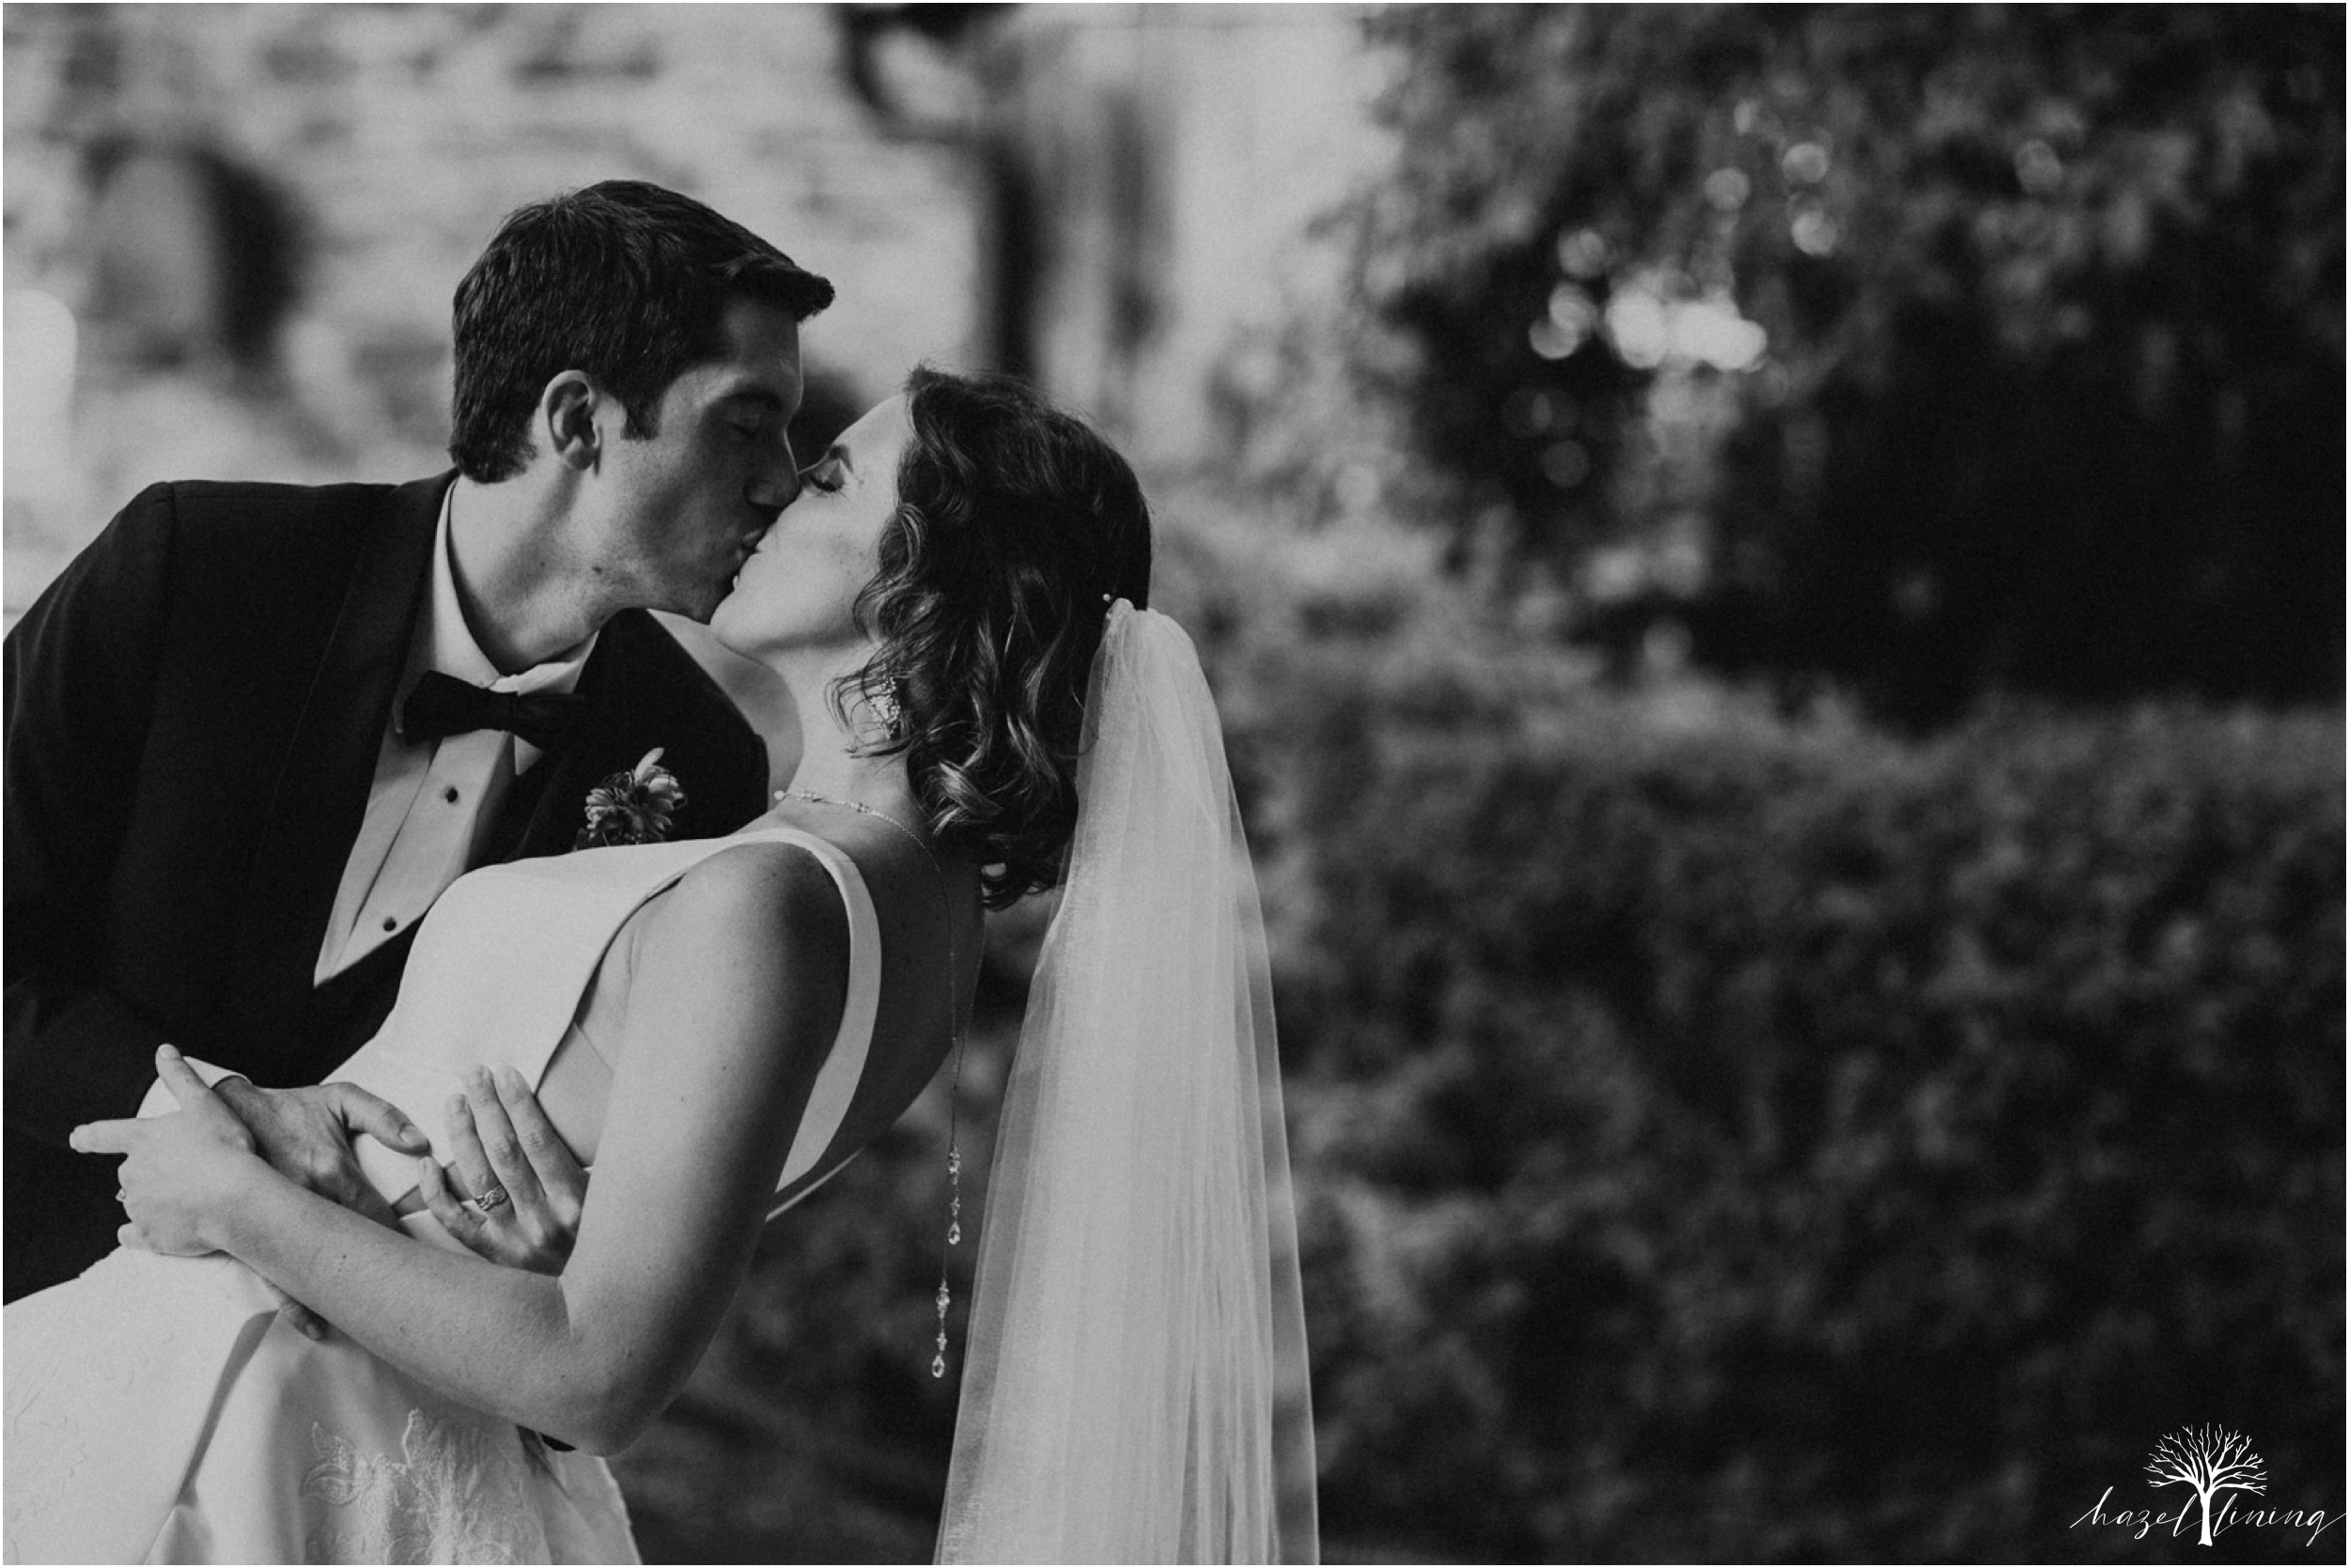 maureen-hepner-anthony-giordano-rose-bank-winery-newtow-pennsylvania-luxury-summer-wedding-hazel-lining-photography-destination-elopement-wedding-engagement-photography_0105.jpg